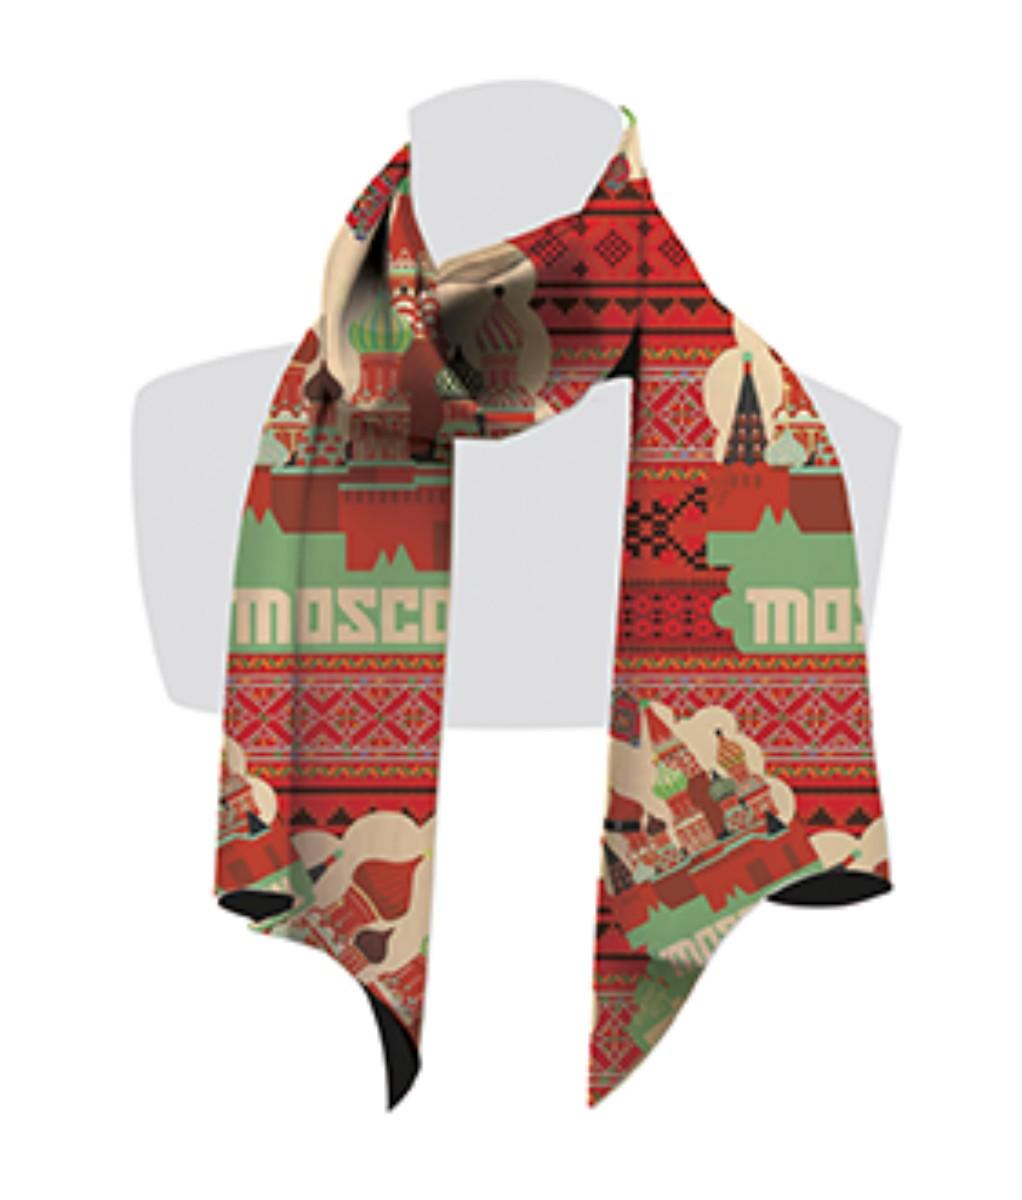 cd09e4a568e Echarpe Femme polaire FST HANDWEAR MOSCOW - Livraison Gratuite